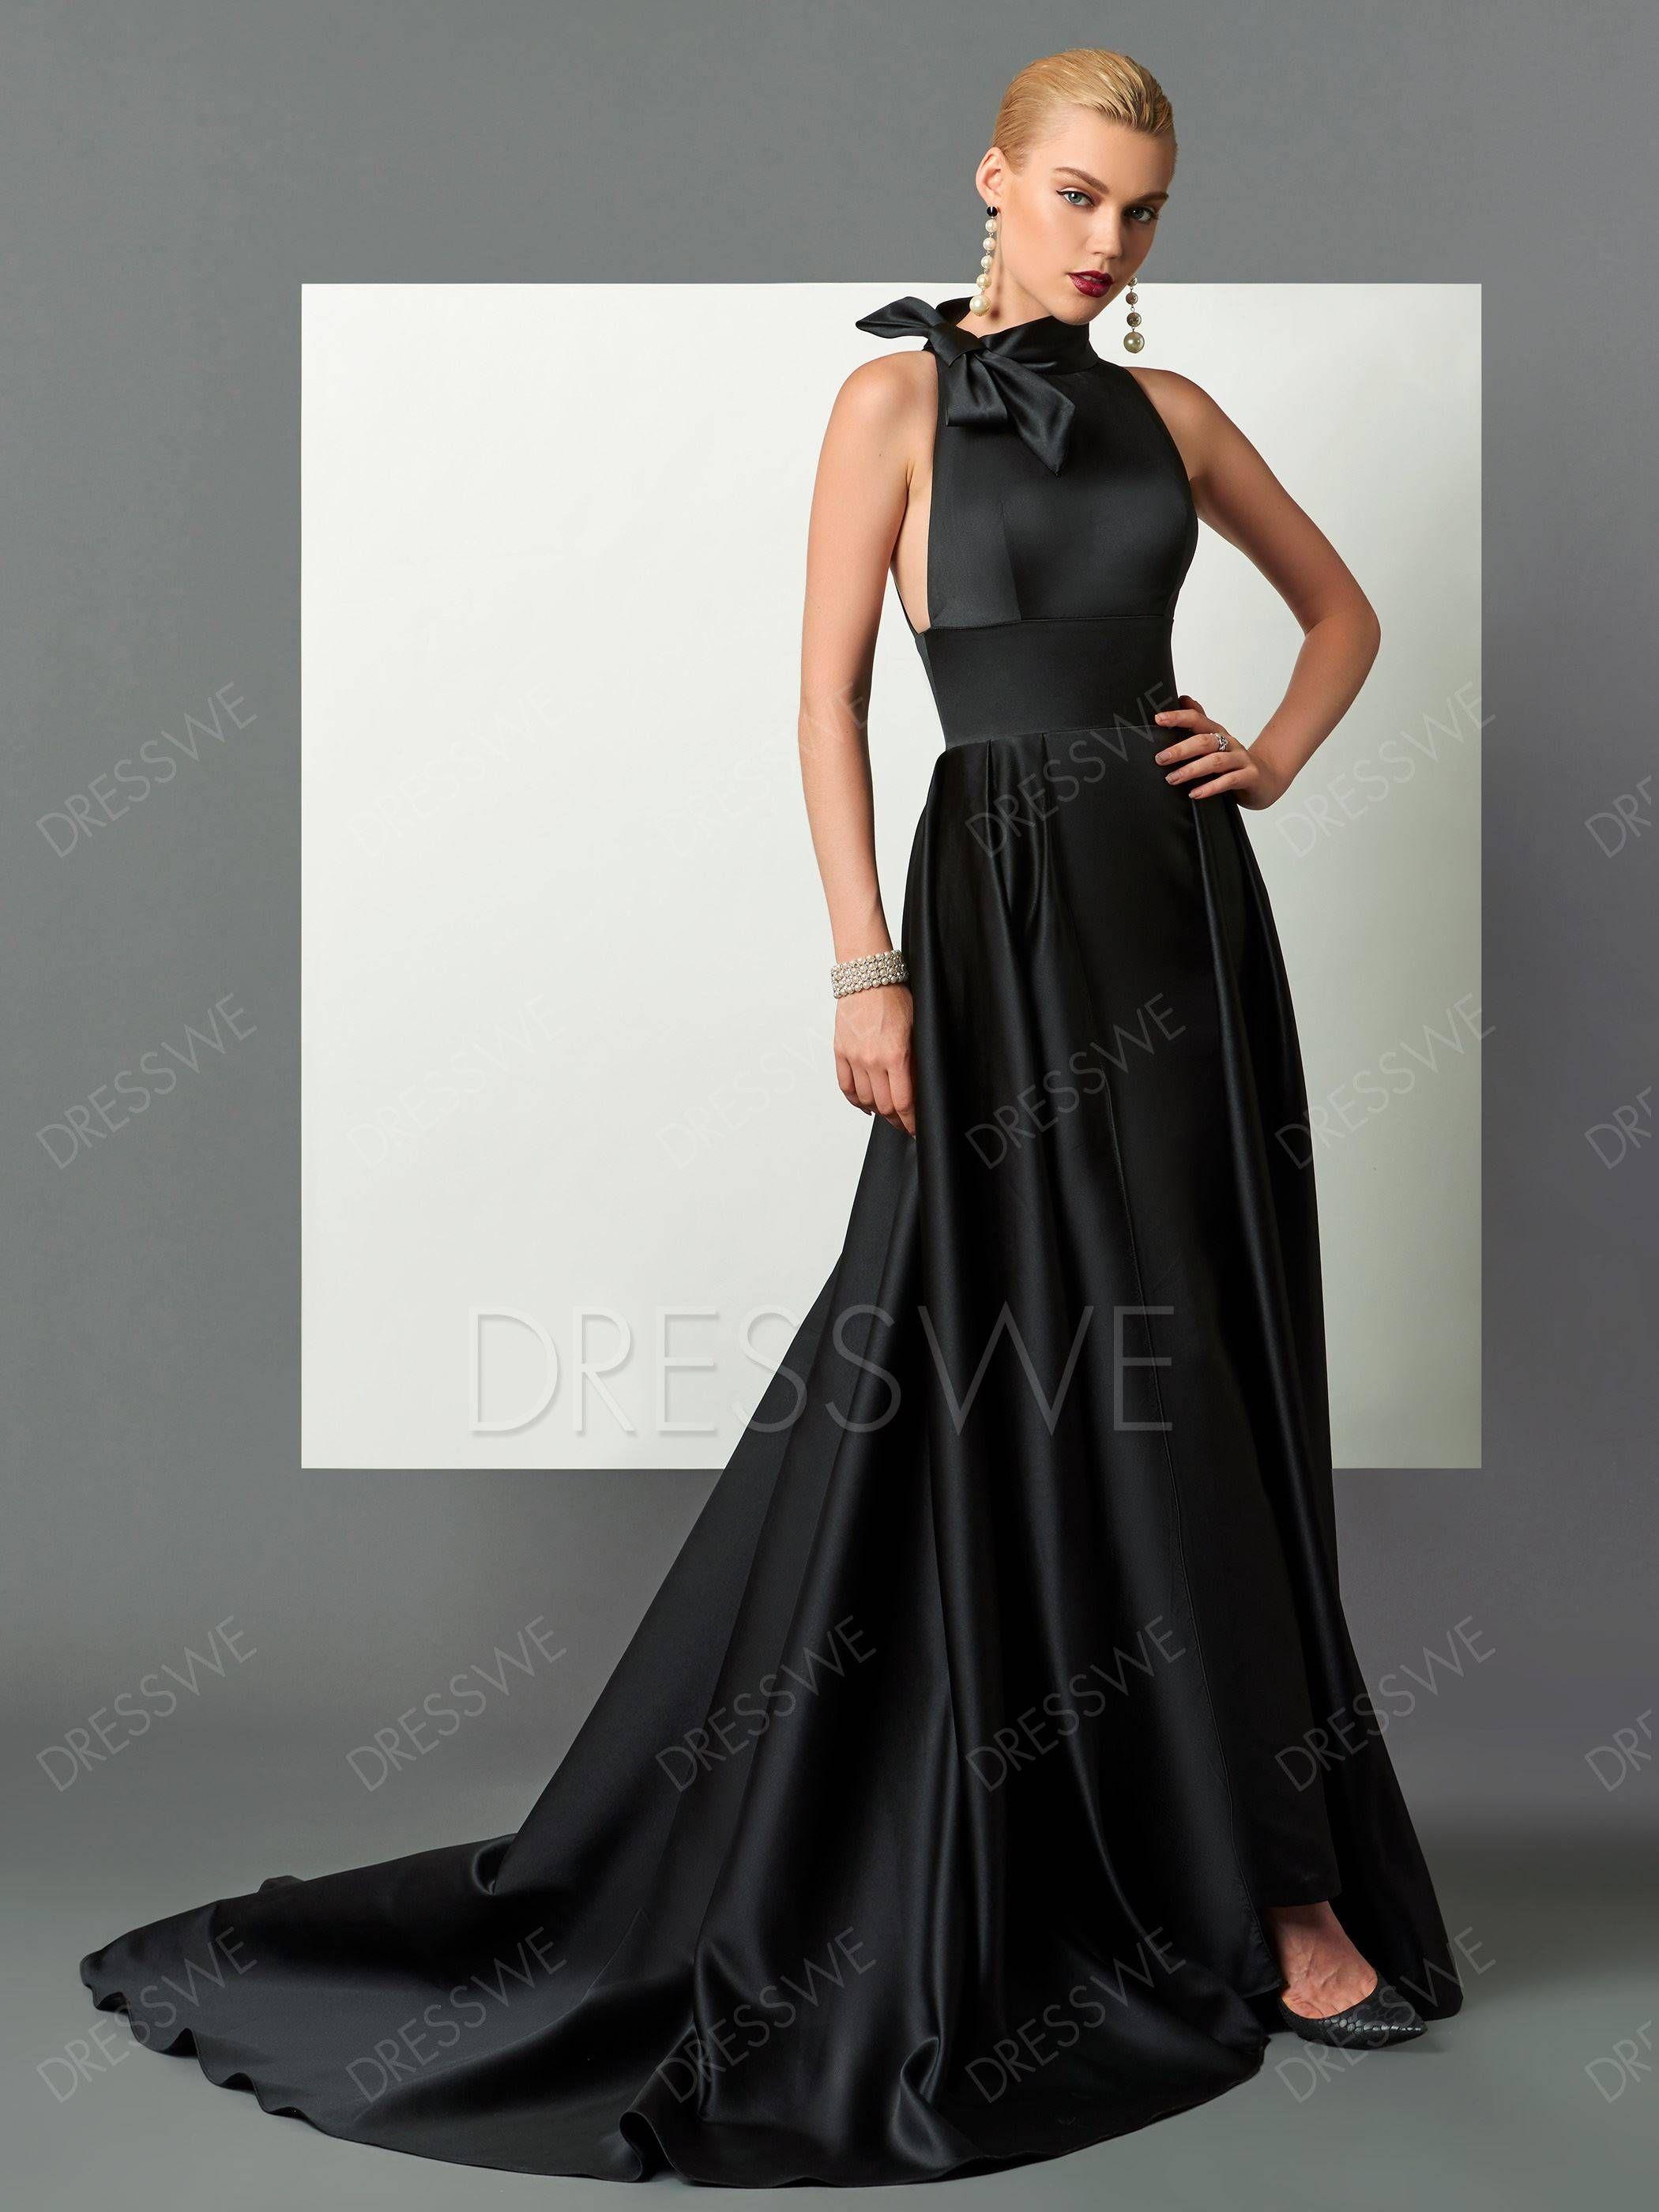 c6f36c58f5c Classic Black Halter Satin A Line Long Evening Dress in 2019 ...